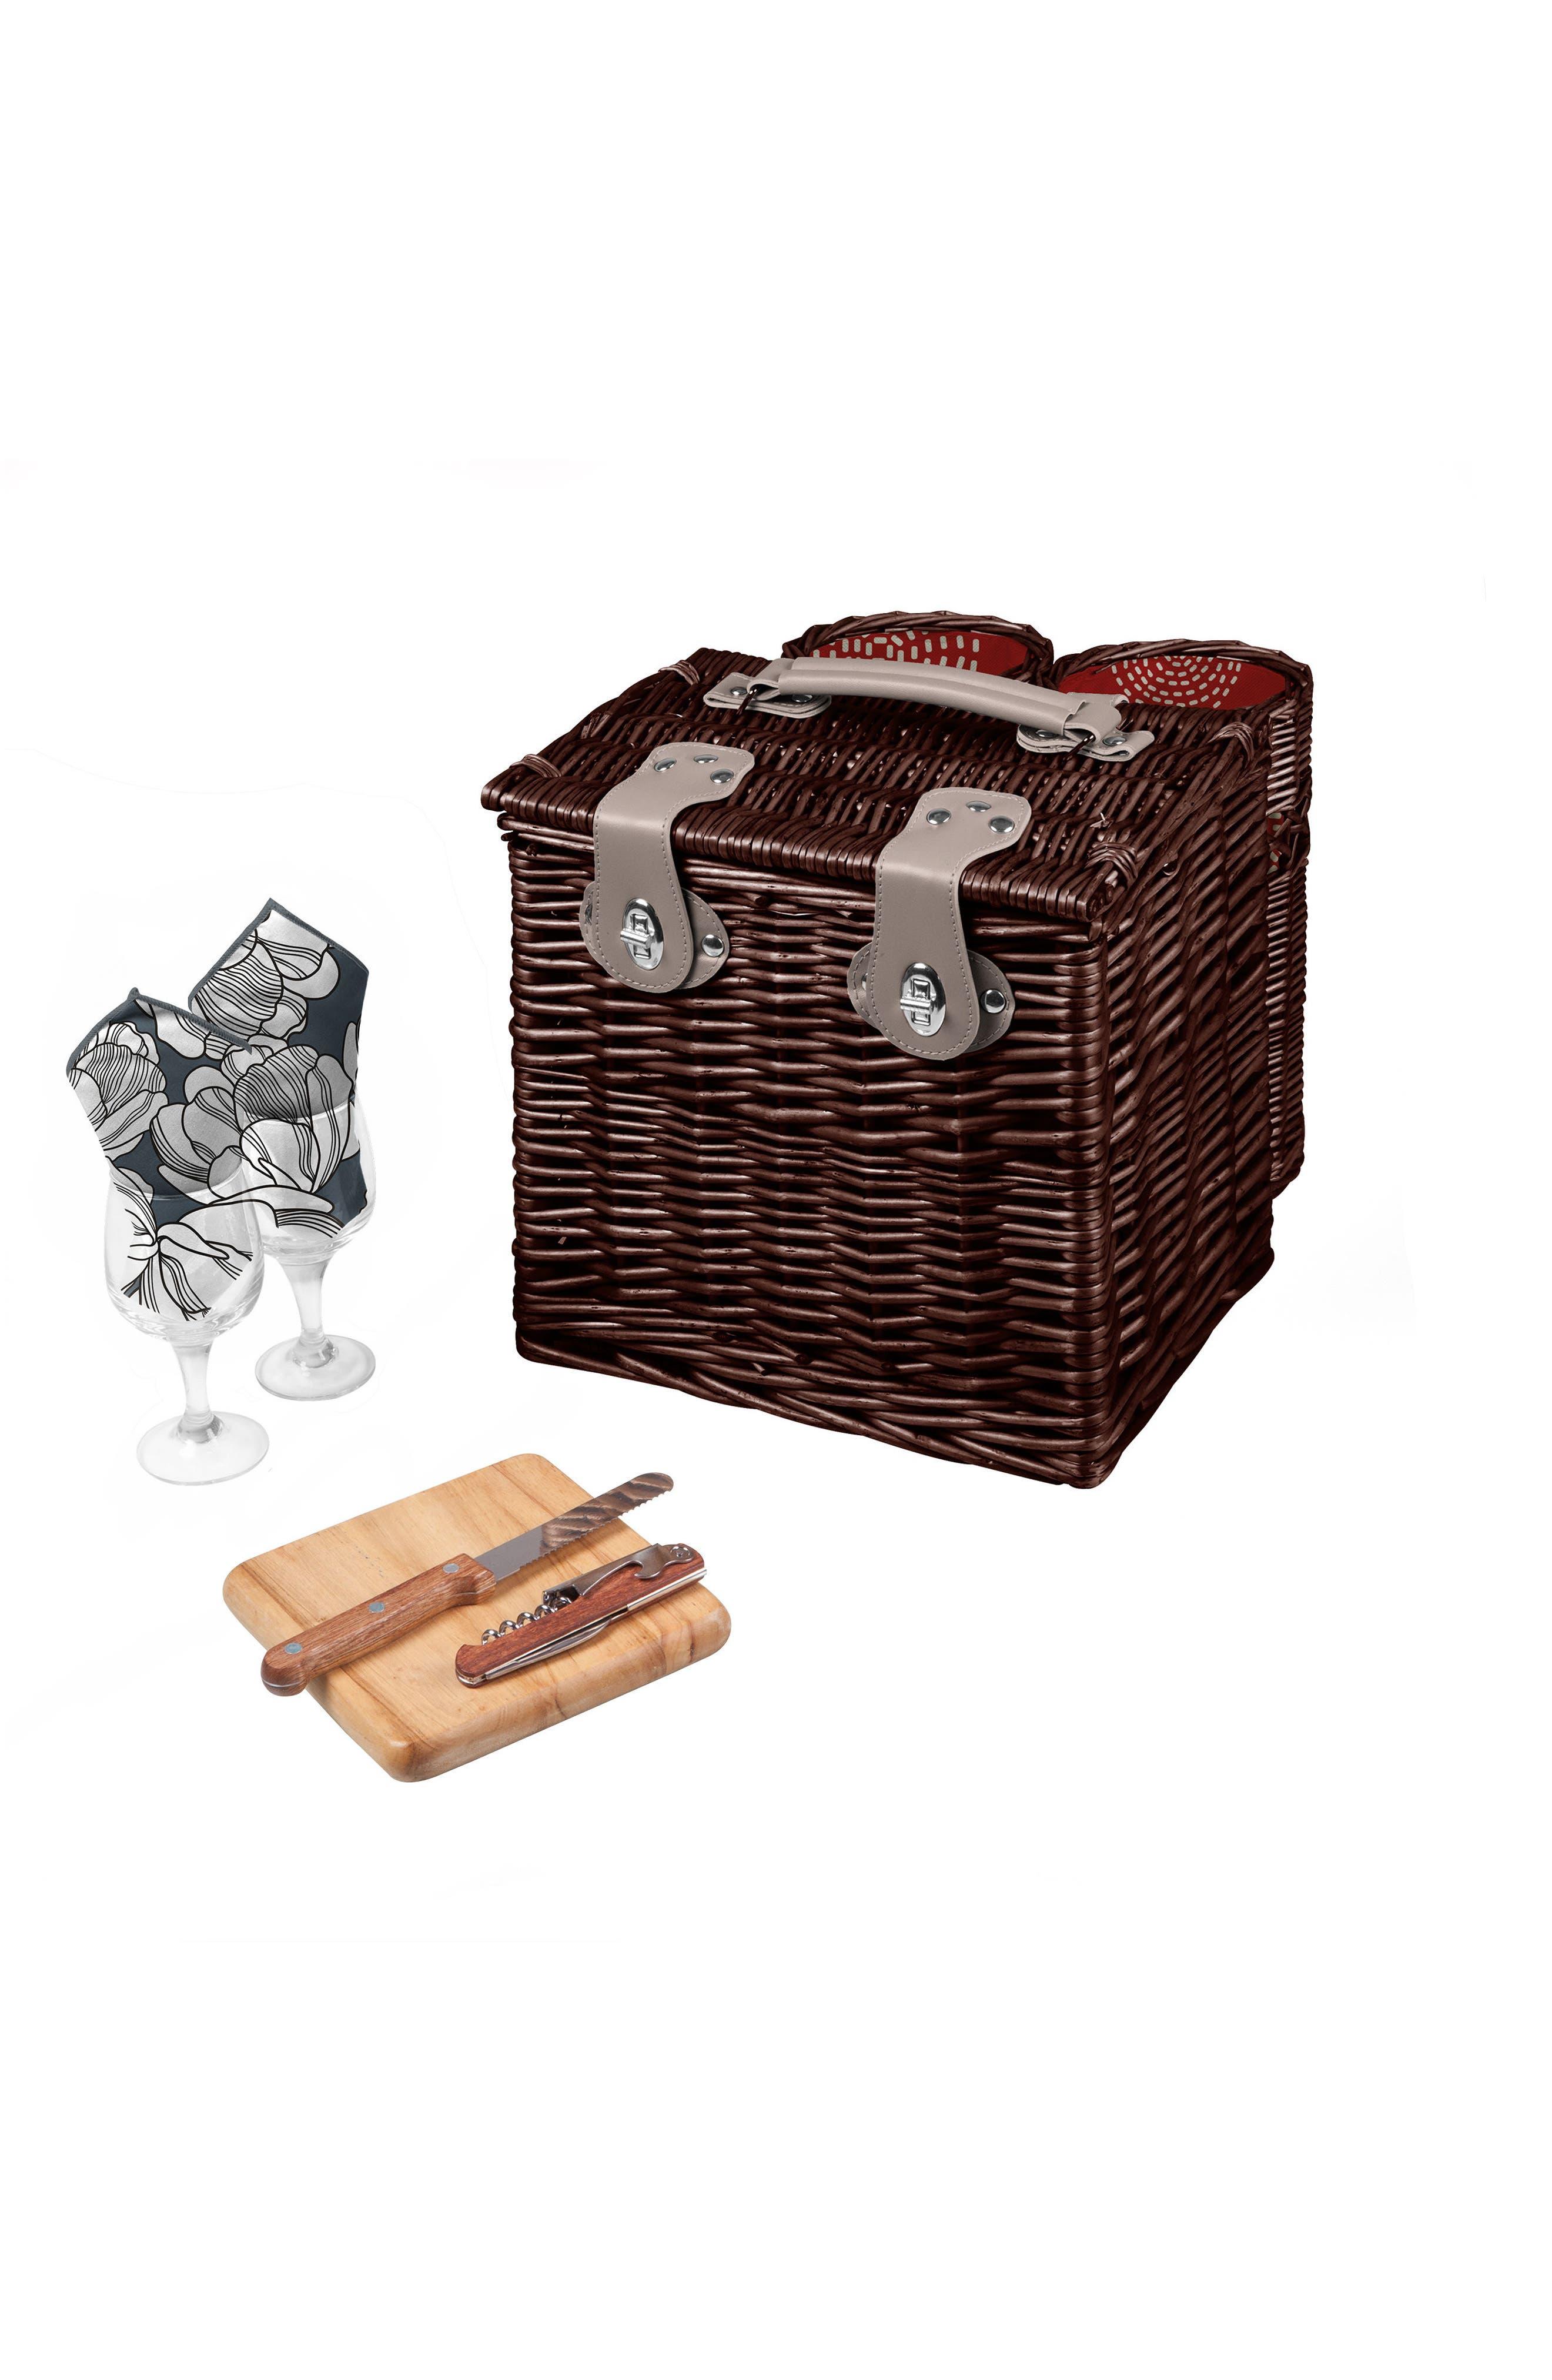 Main Image - Picnic Time Vino Wine & Cheese Picnic Basket